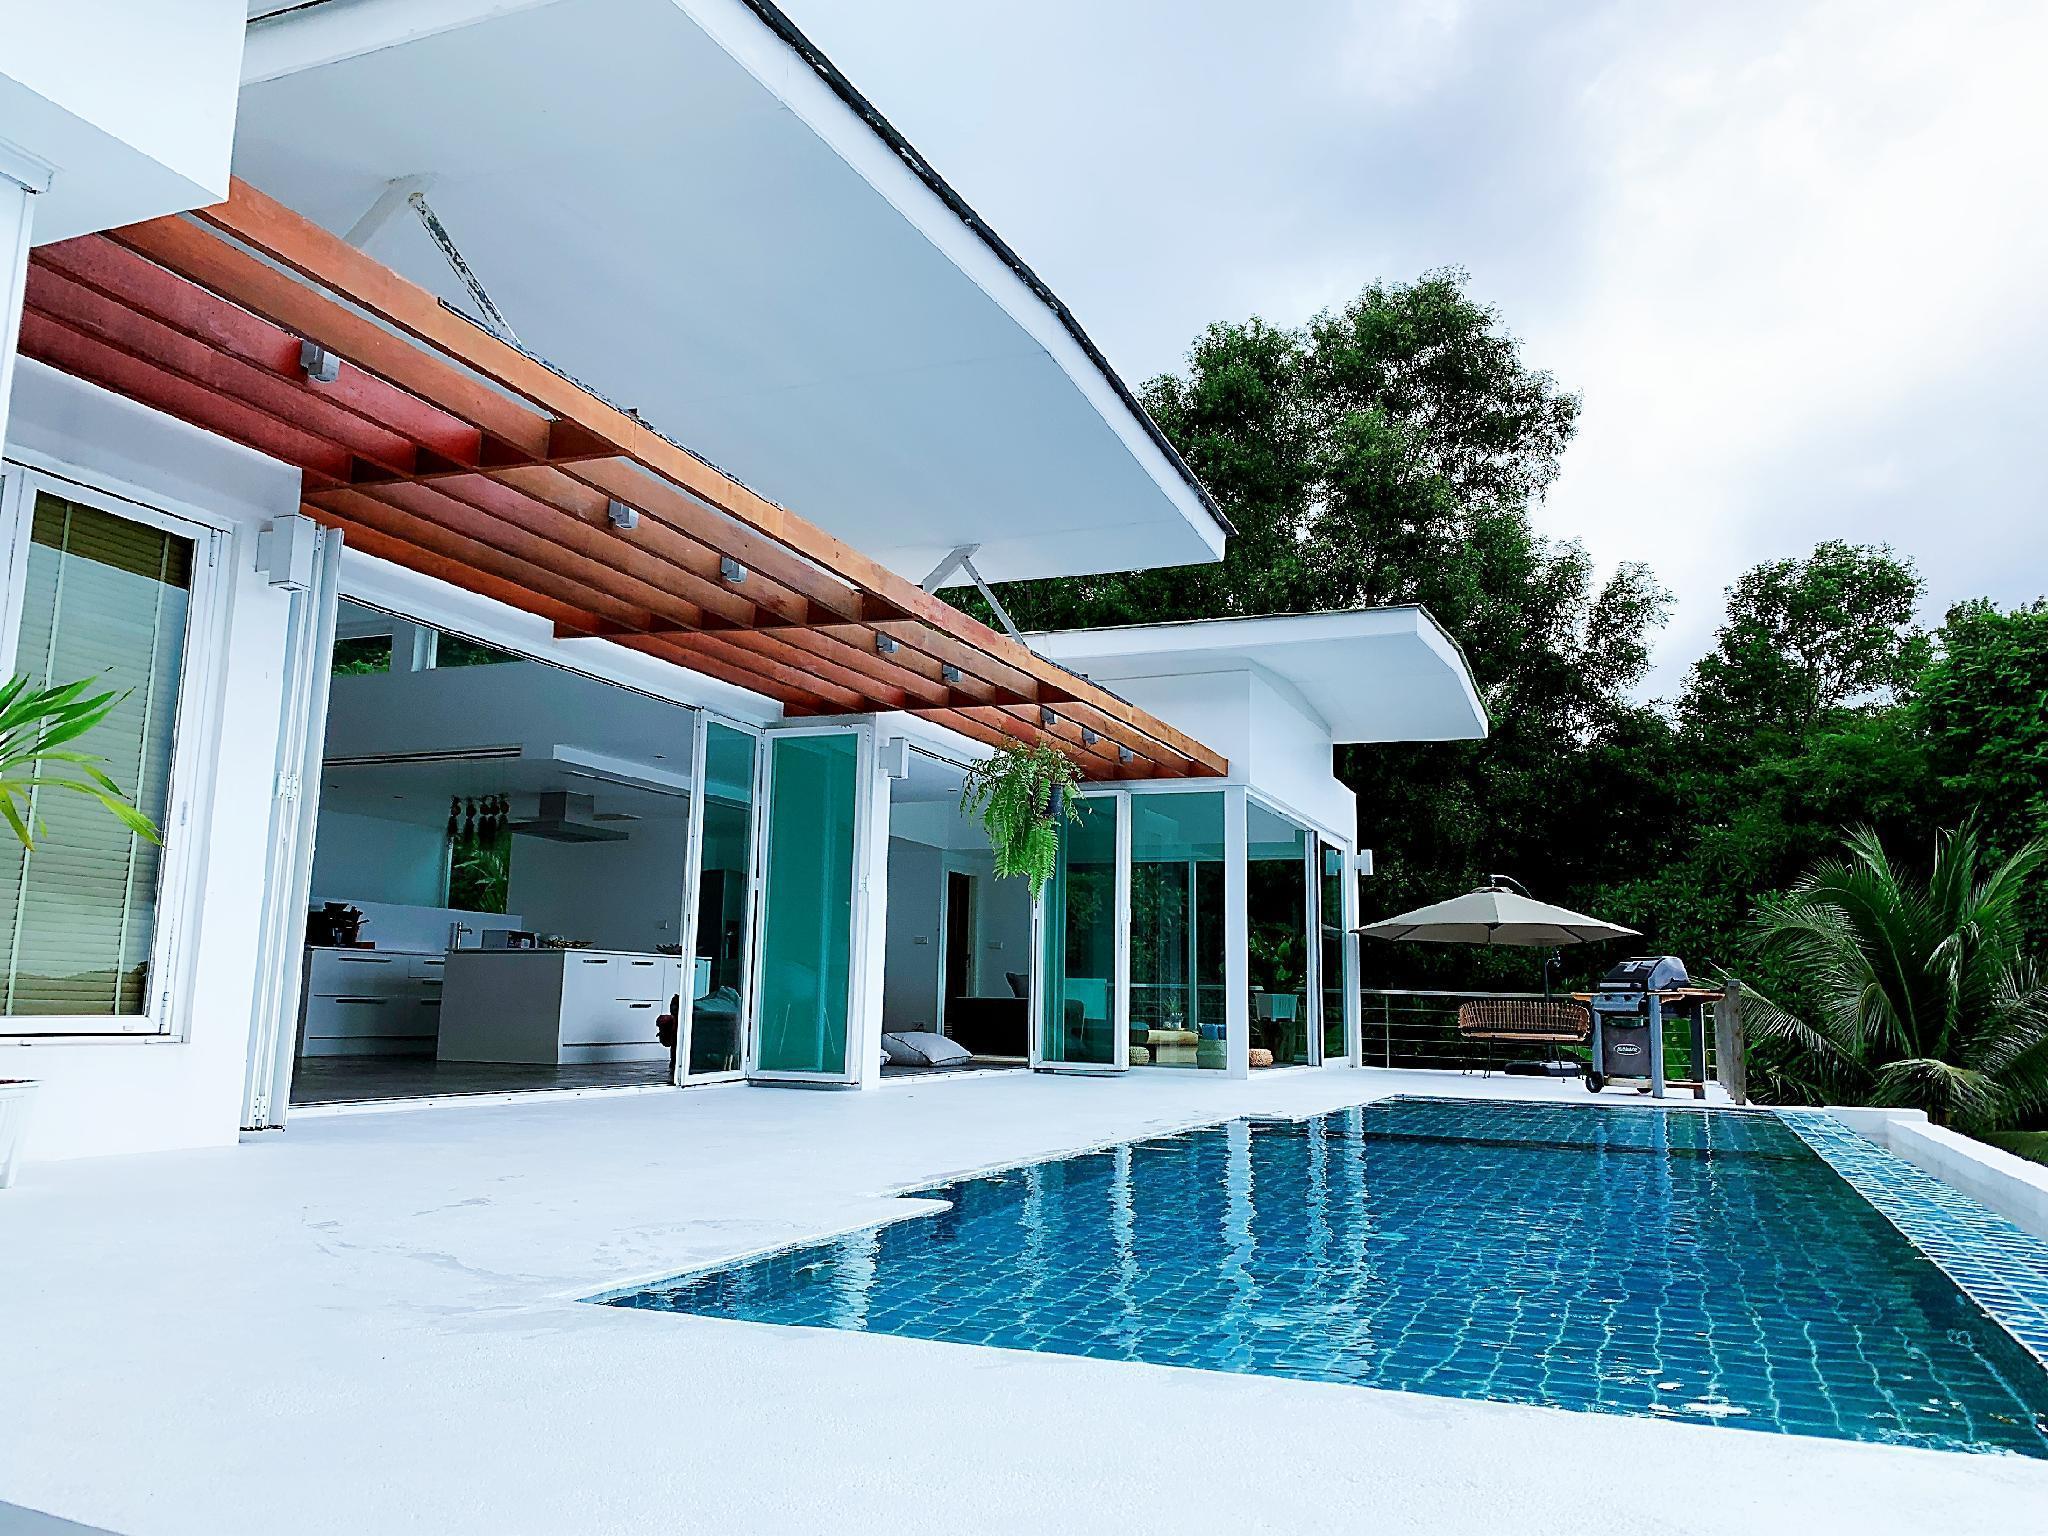 Tain blue Villa three bedrooms Villa วิลลา 3 ห้องนอน 4 ห้องน้ำส่วนตัว ขนาด 1000 ตร.ม. – กมลา